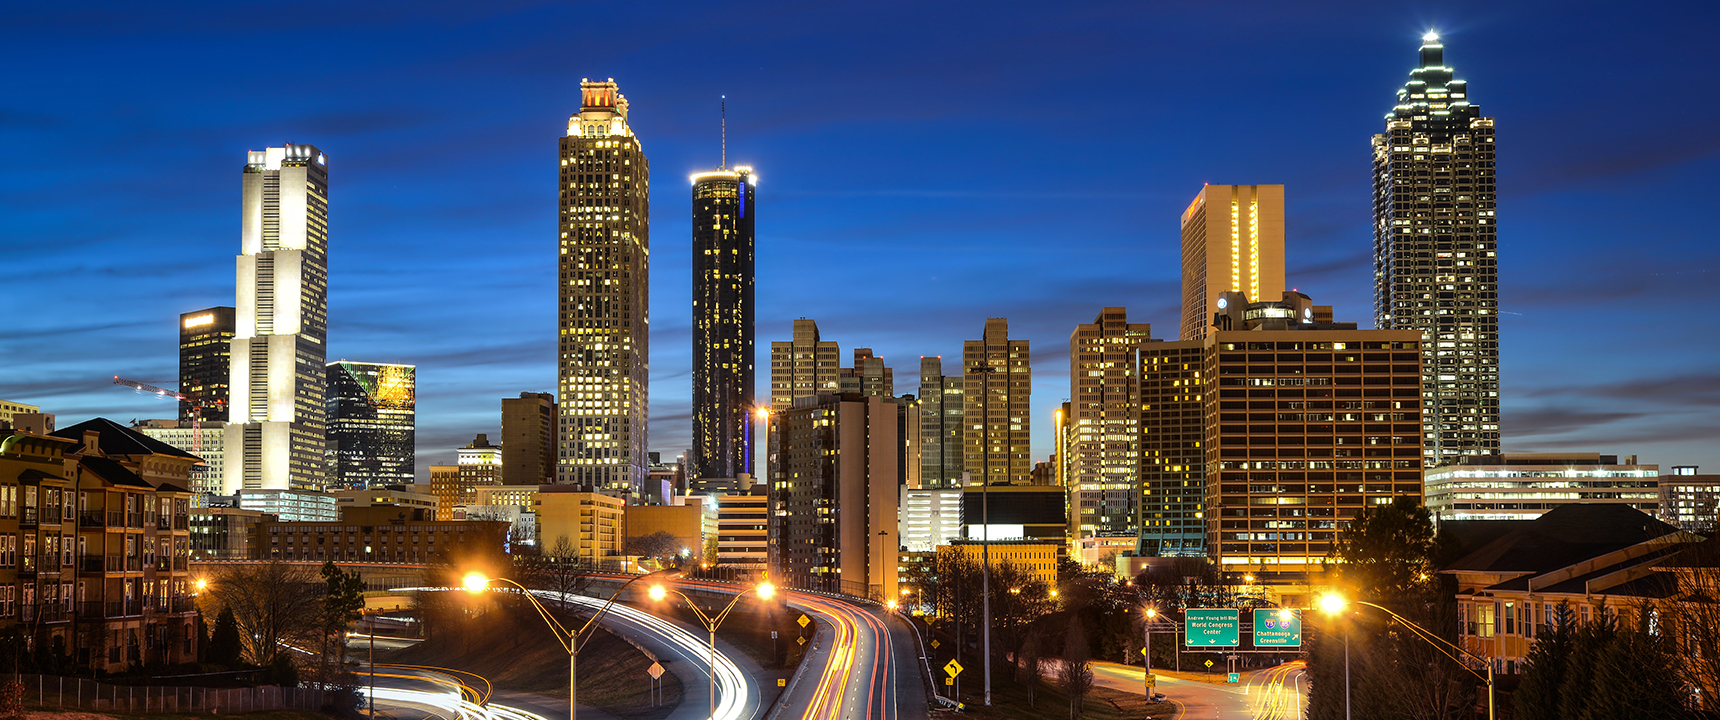 Photo of Atlanta, Georgia where the Southeast Business Center is located.